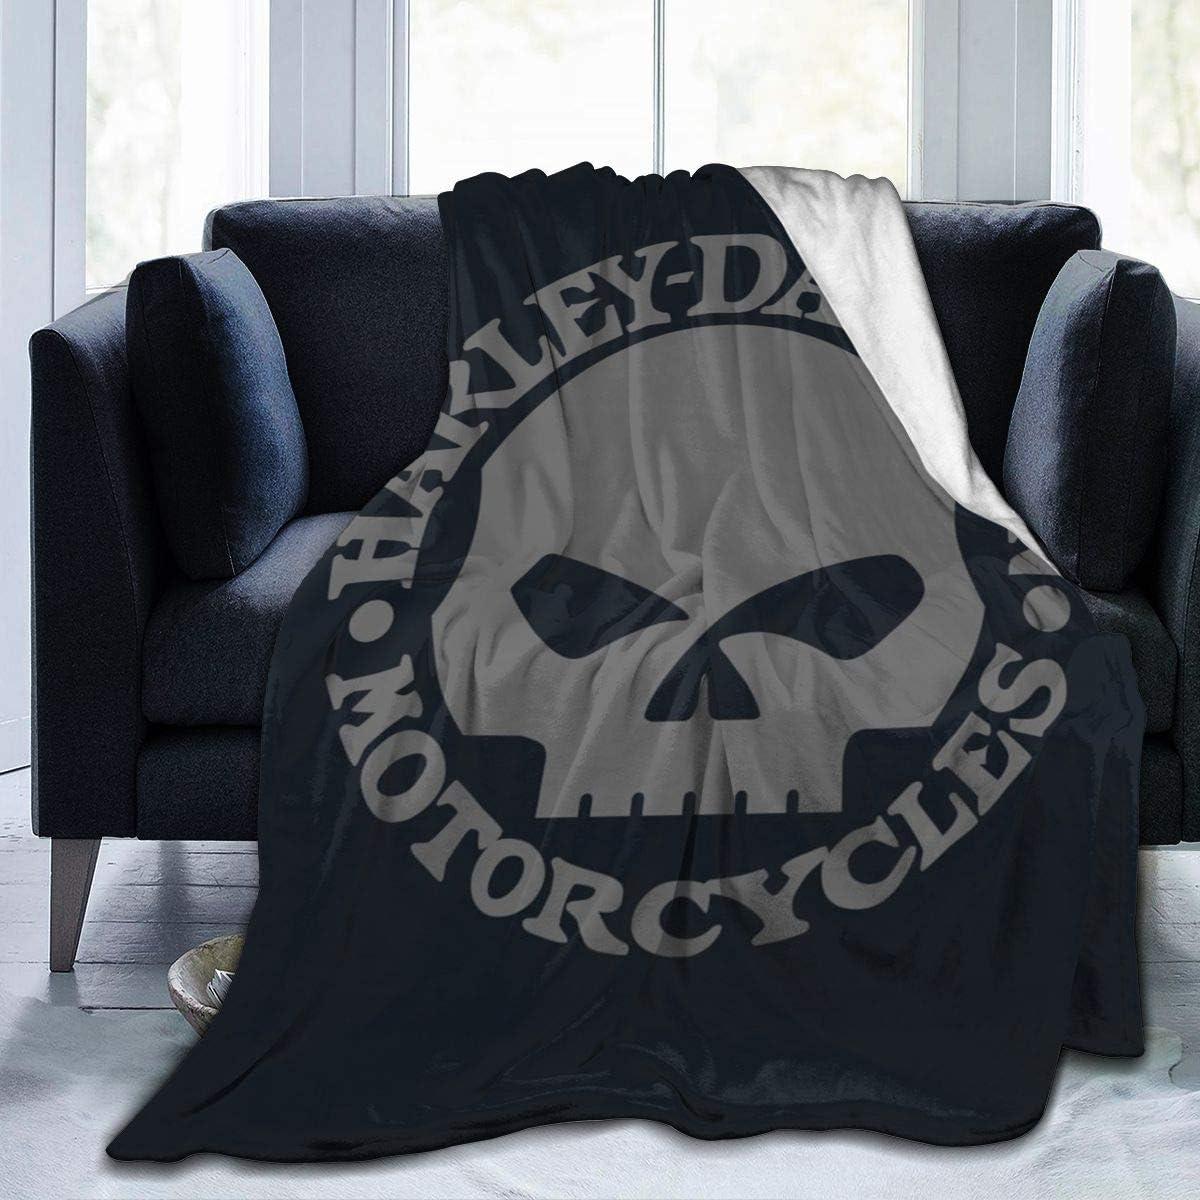 Harley Davidson Blanket